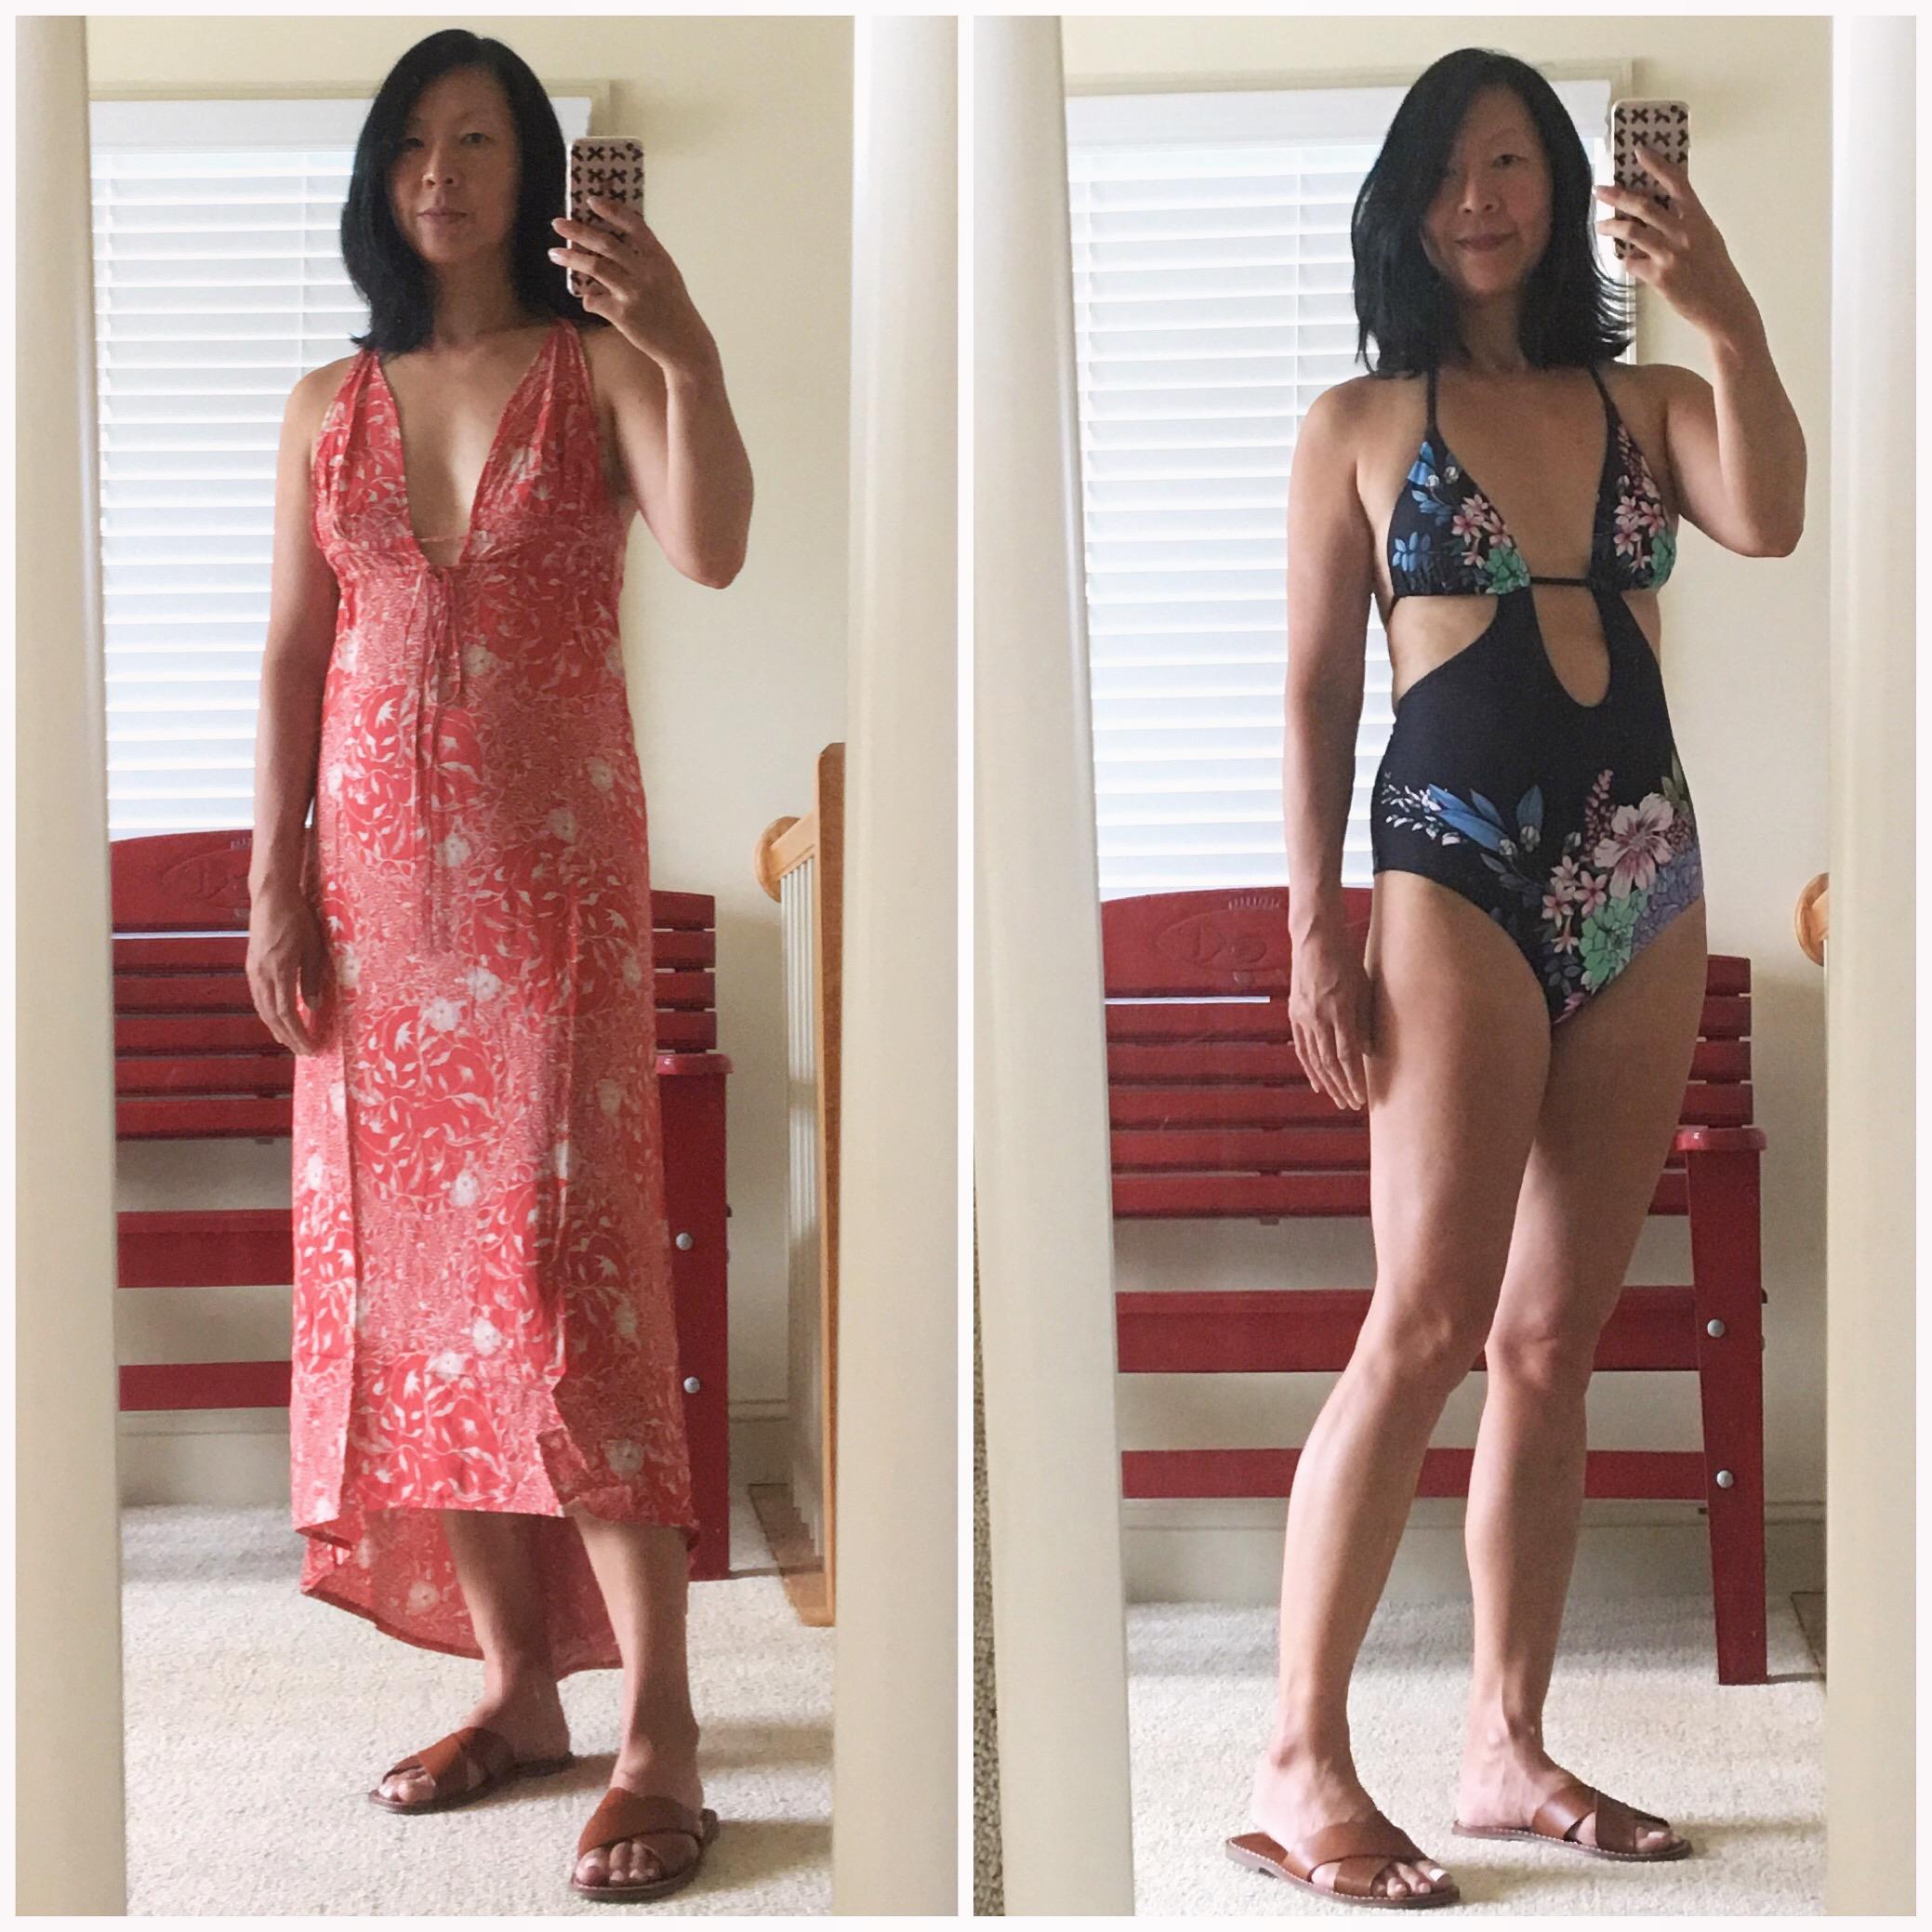 e11824fad3 dress   one-piece swimsuit review